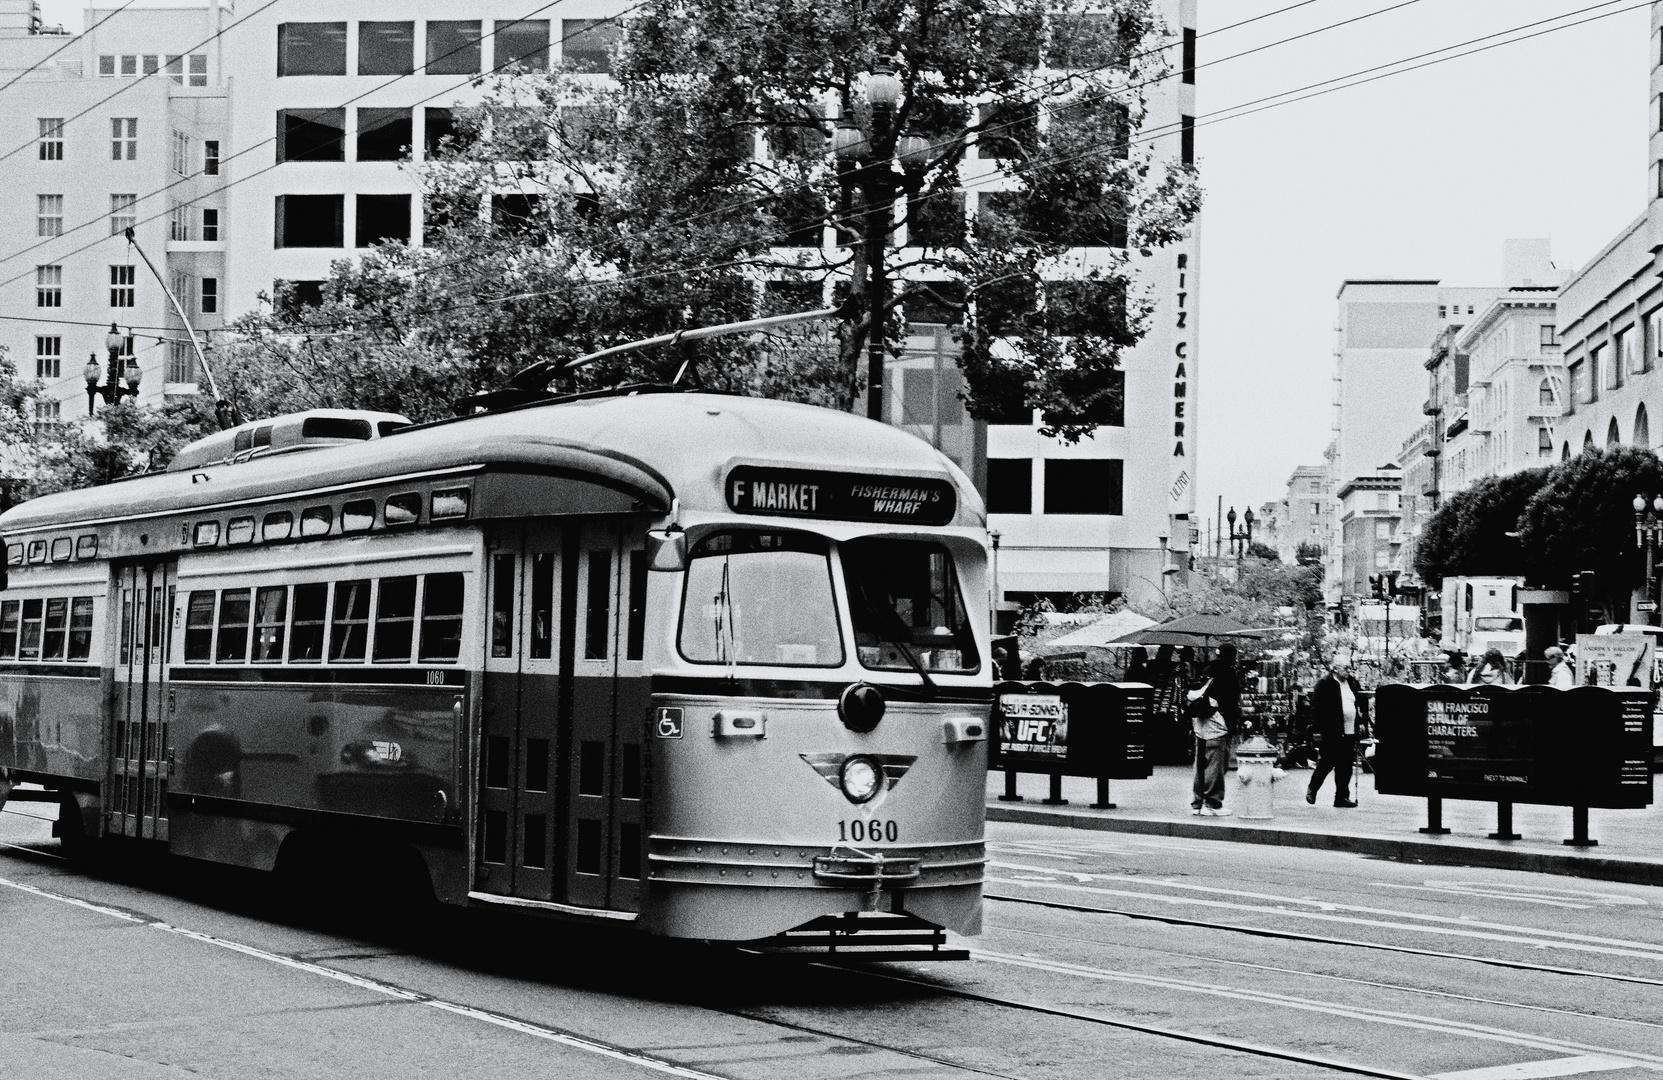 Streetcar 1060 (San Francisco)